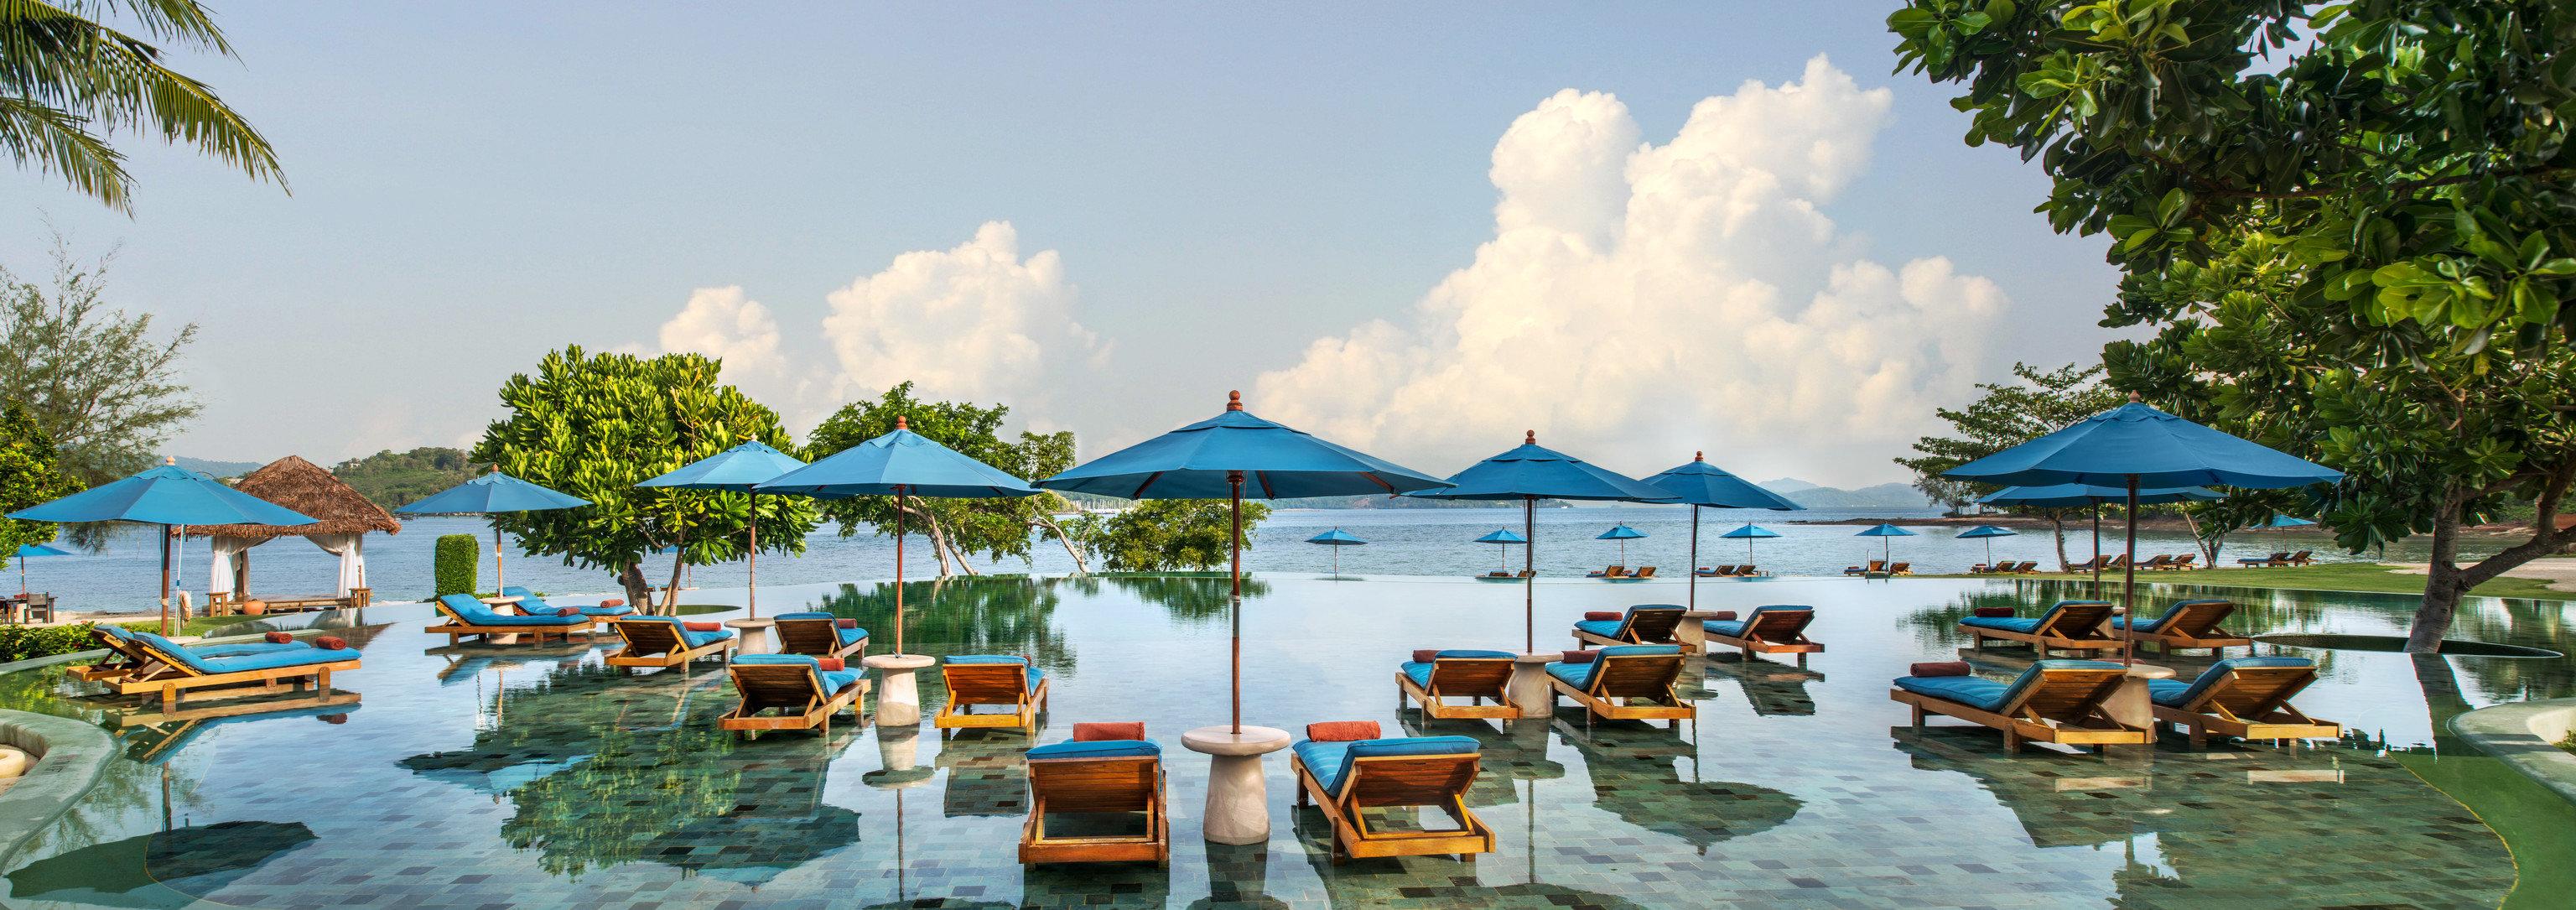 Beach Hotels Phuket Thailand Resort leisure swimming pool tourism resort town vacation tropics caribbean palm tree Lagoon tree arecales water real estate recreation estate sky bay